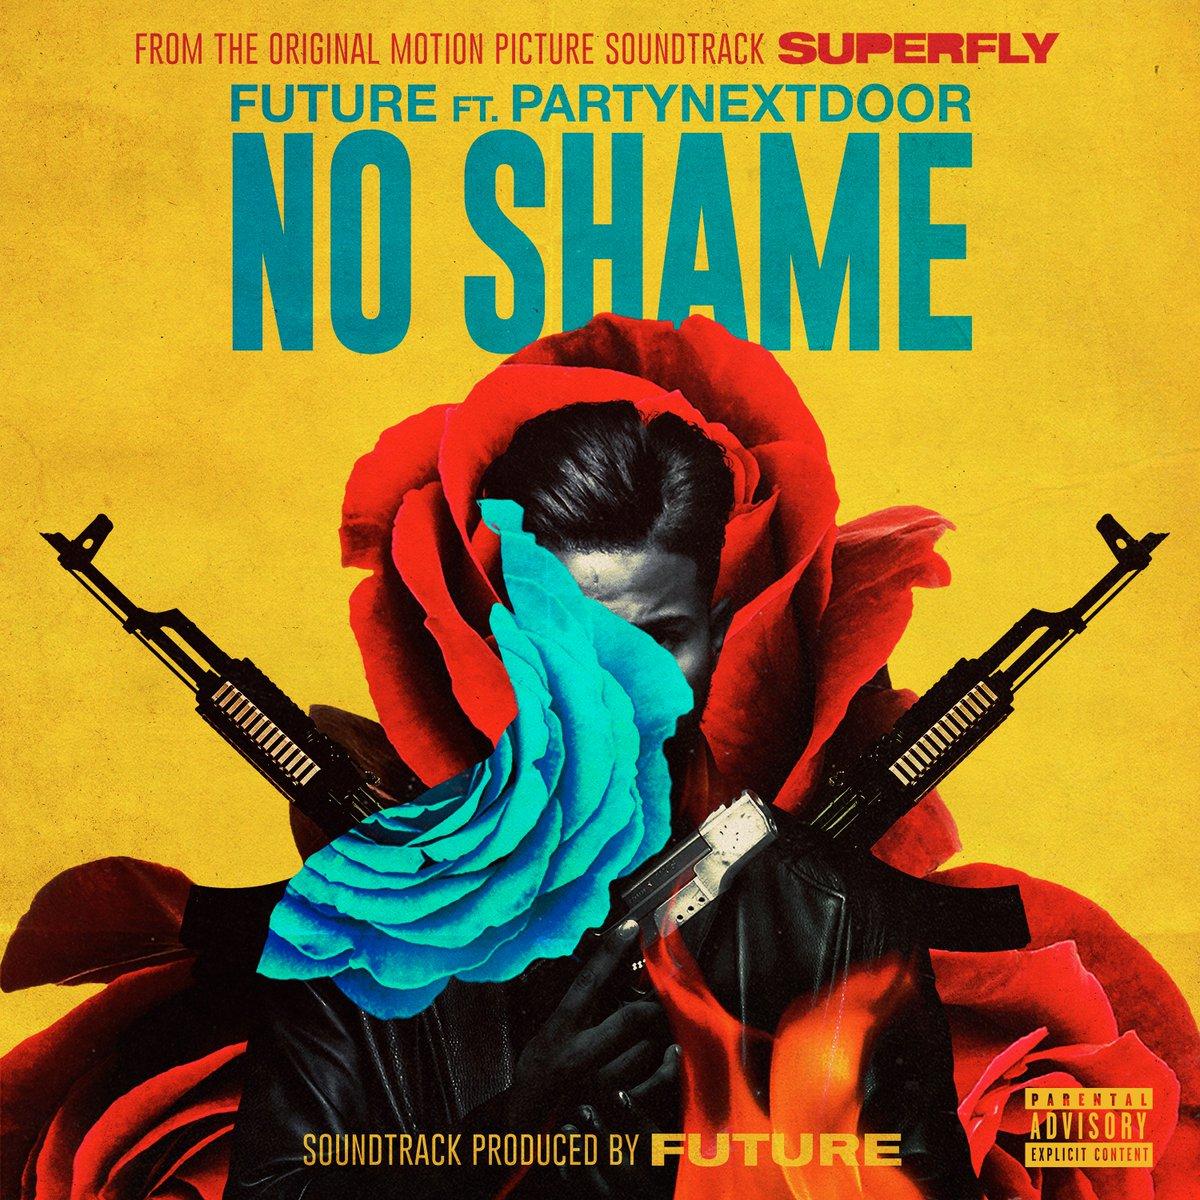 #NoShame feat @partynextdoor TODAY at NOON #Superfly @SuperflyMovie